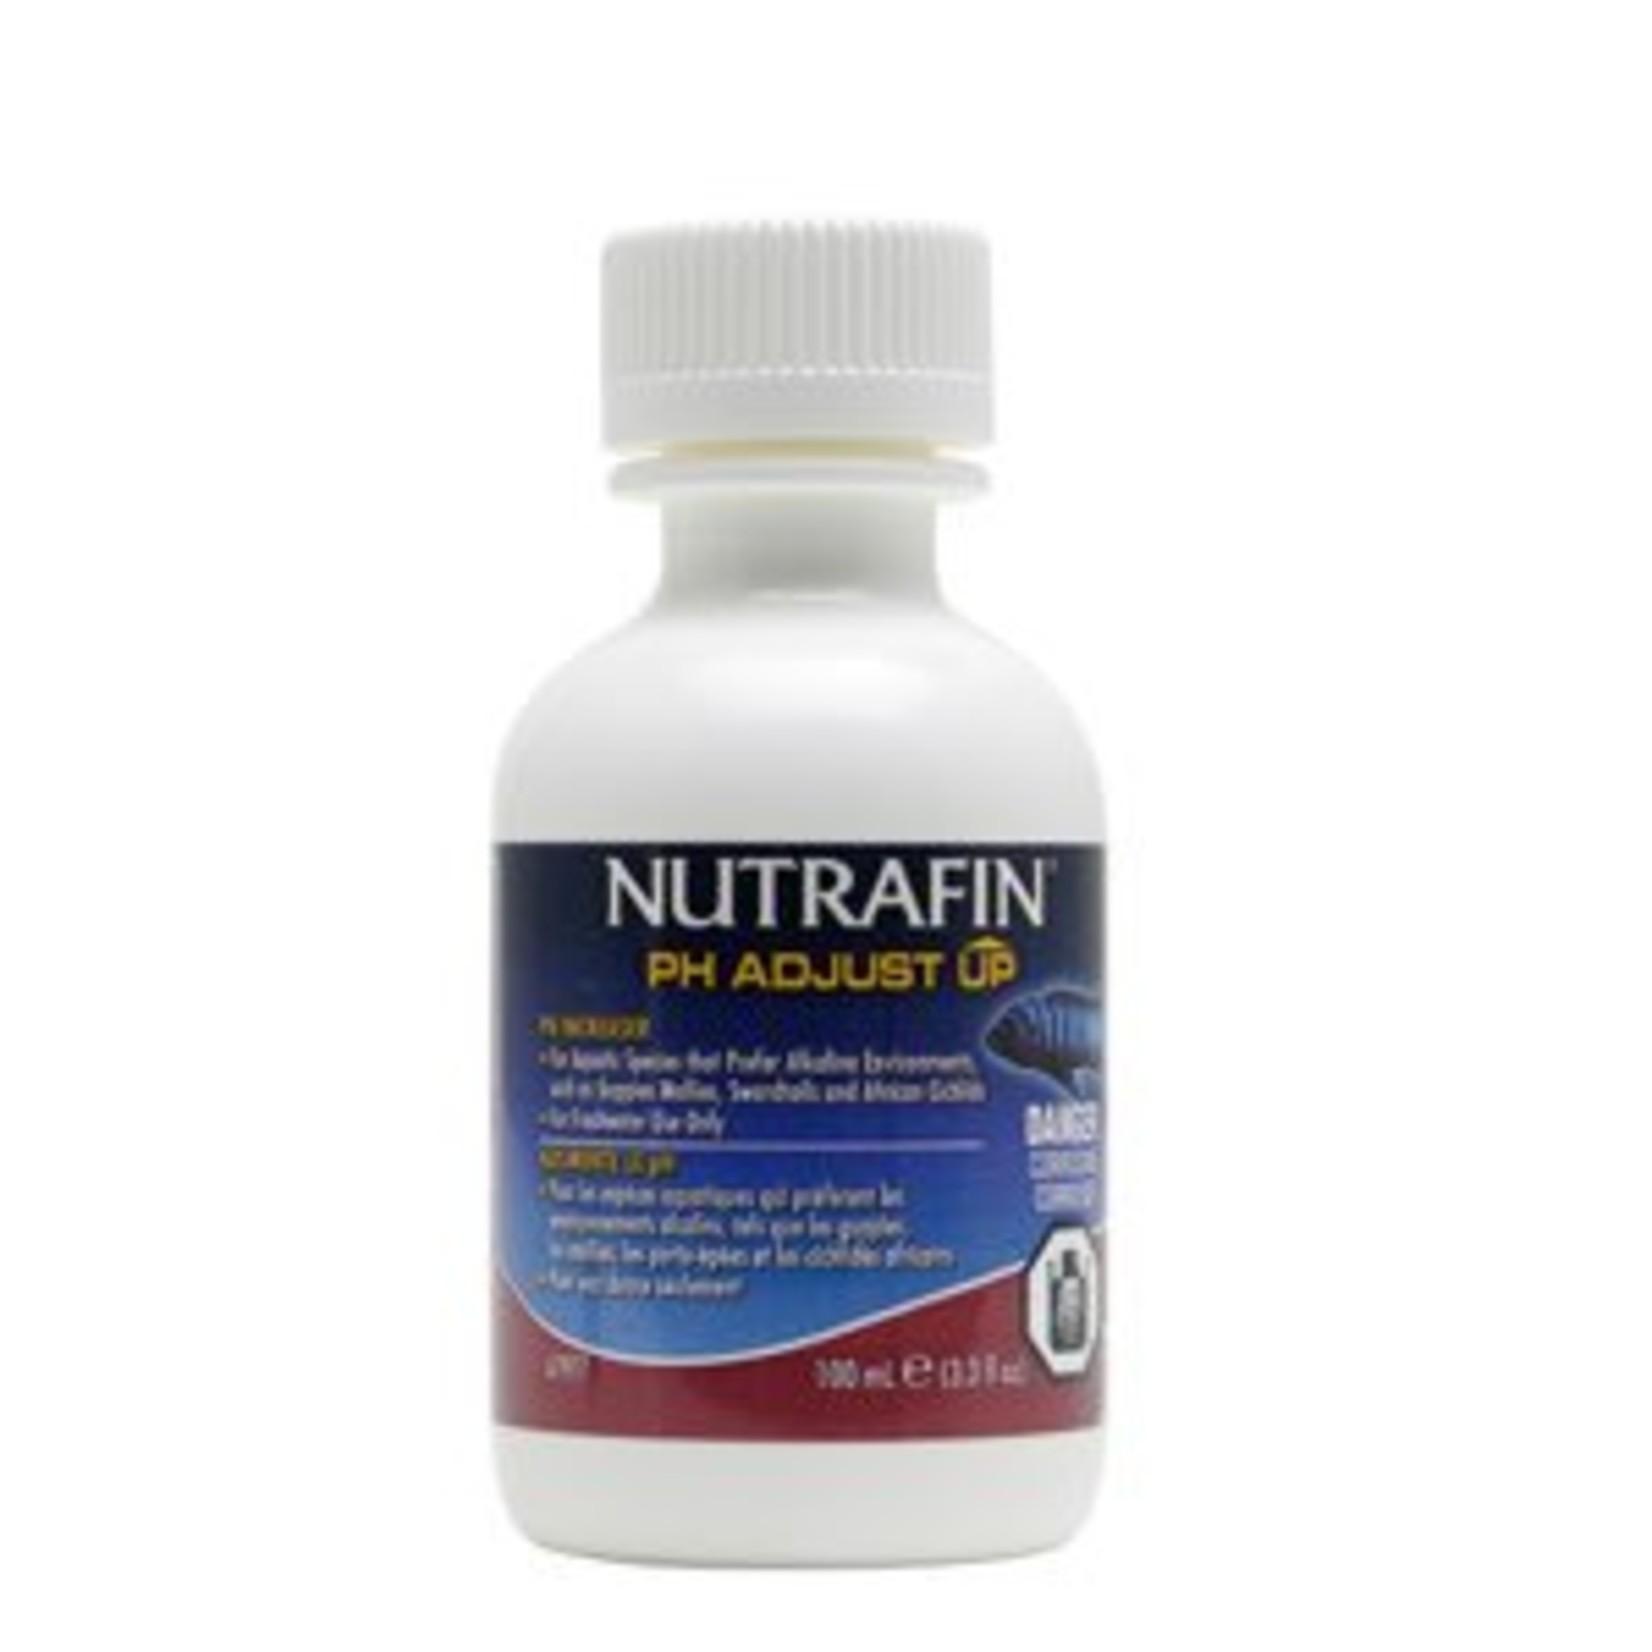 Nutrafin NF pH Adj. Up (pH Adjstr), 100ml-V